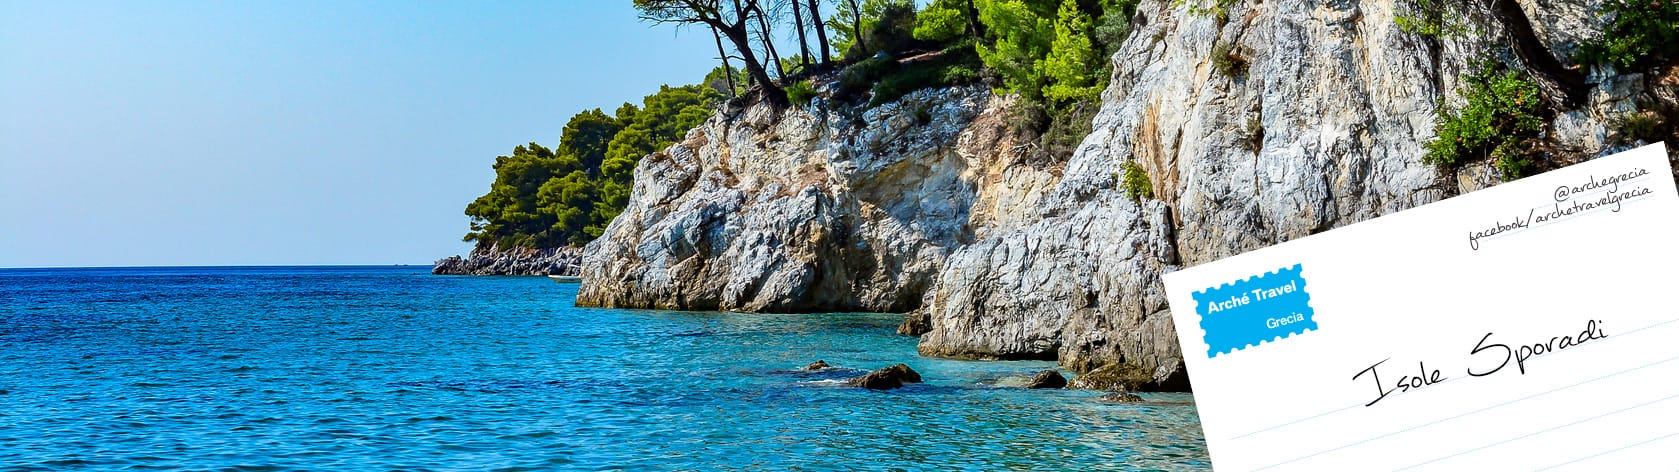 CATALOGHI Viaggi Isole Sporadi Tour Isole Sporadi - Arché Travel - Tour Operator Isole Sporadi Grecia